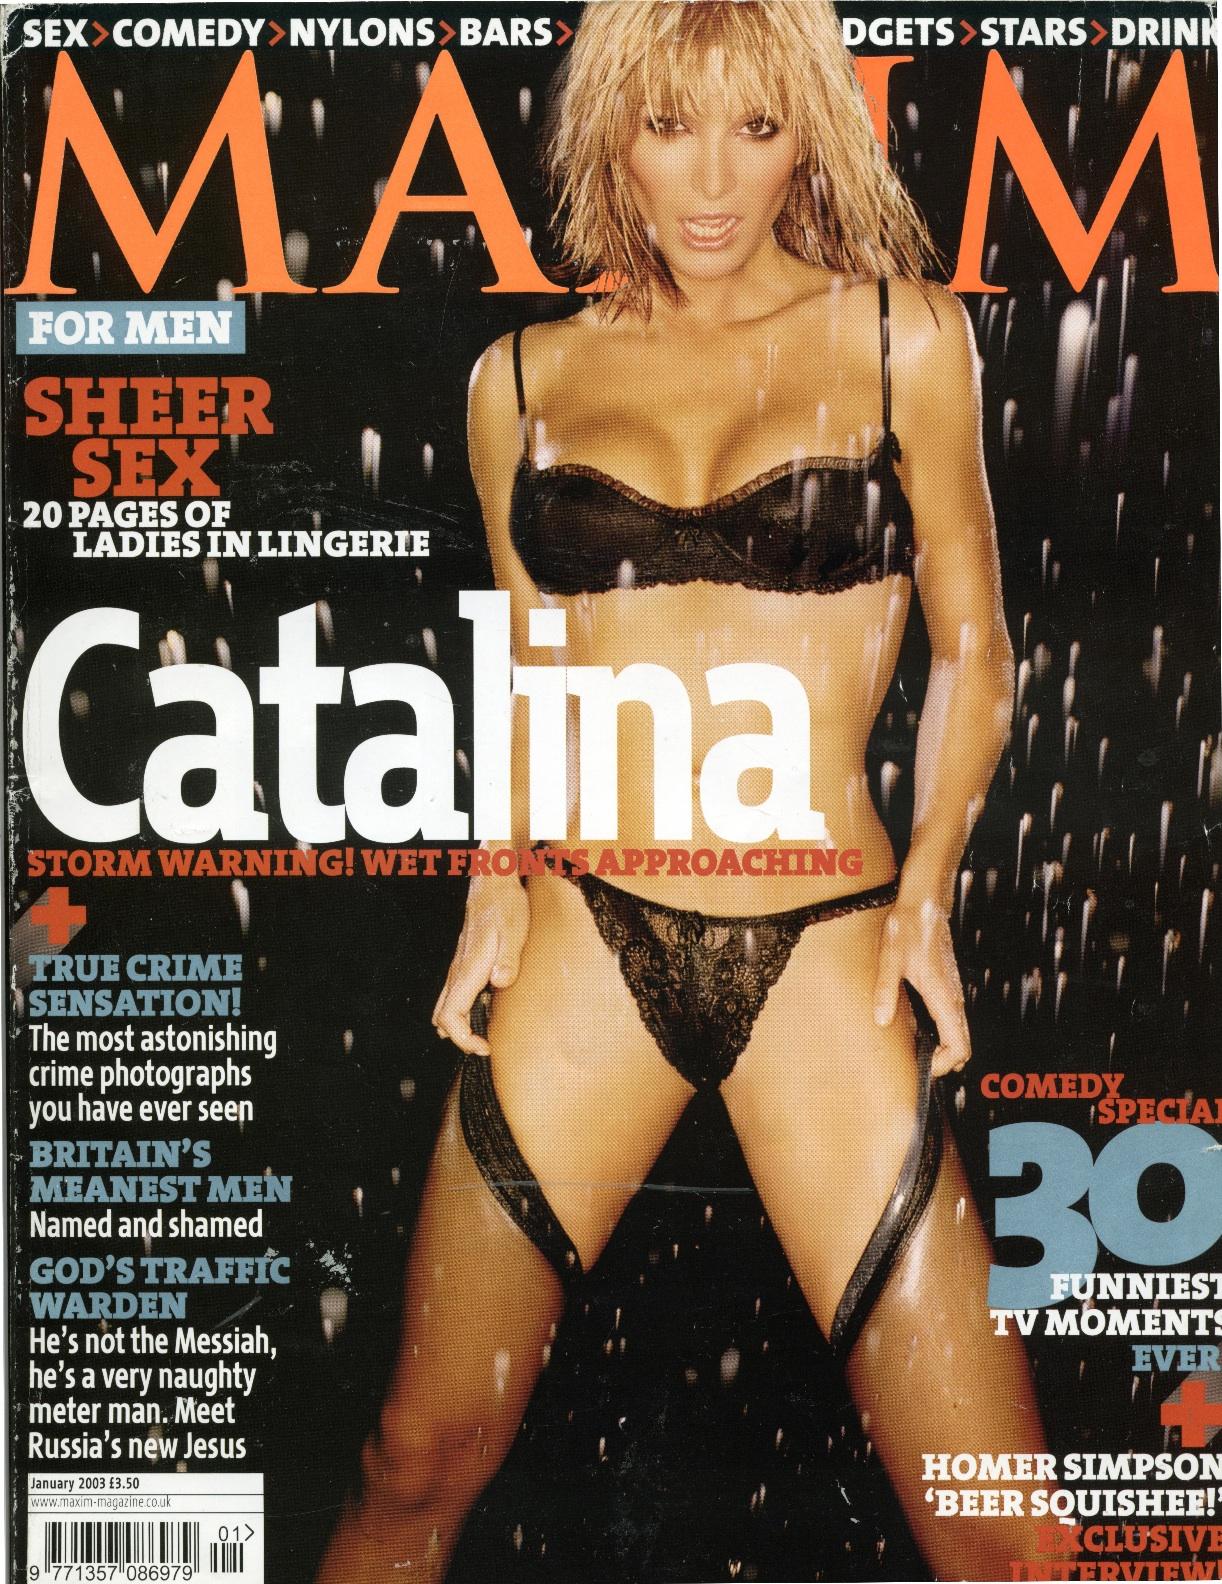 Catalina-Guirado-Cheadle-Maxim